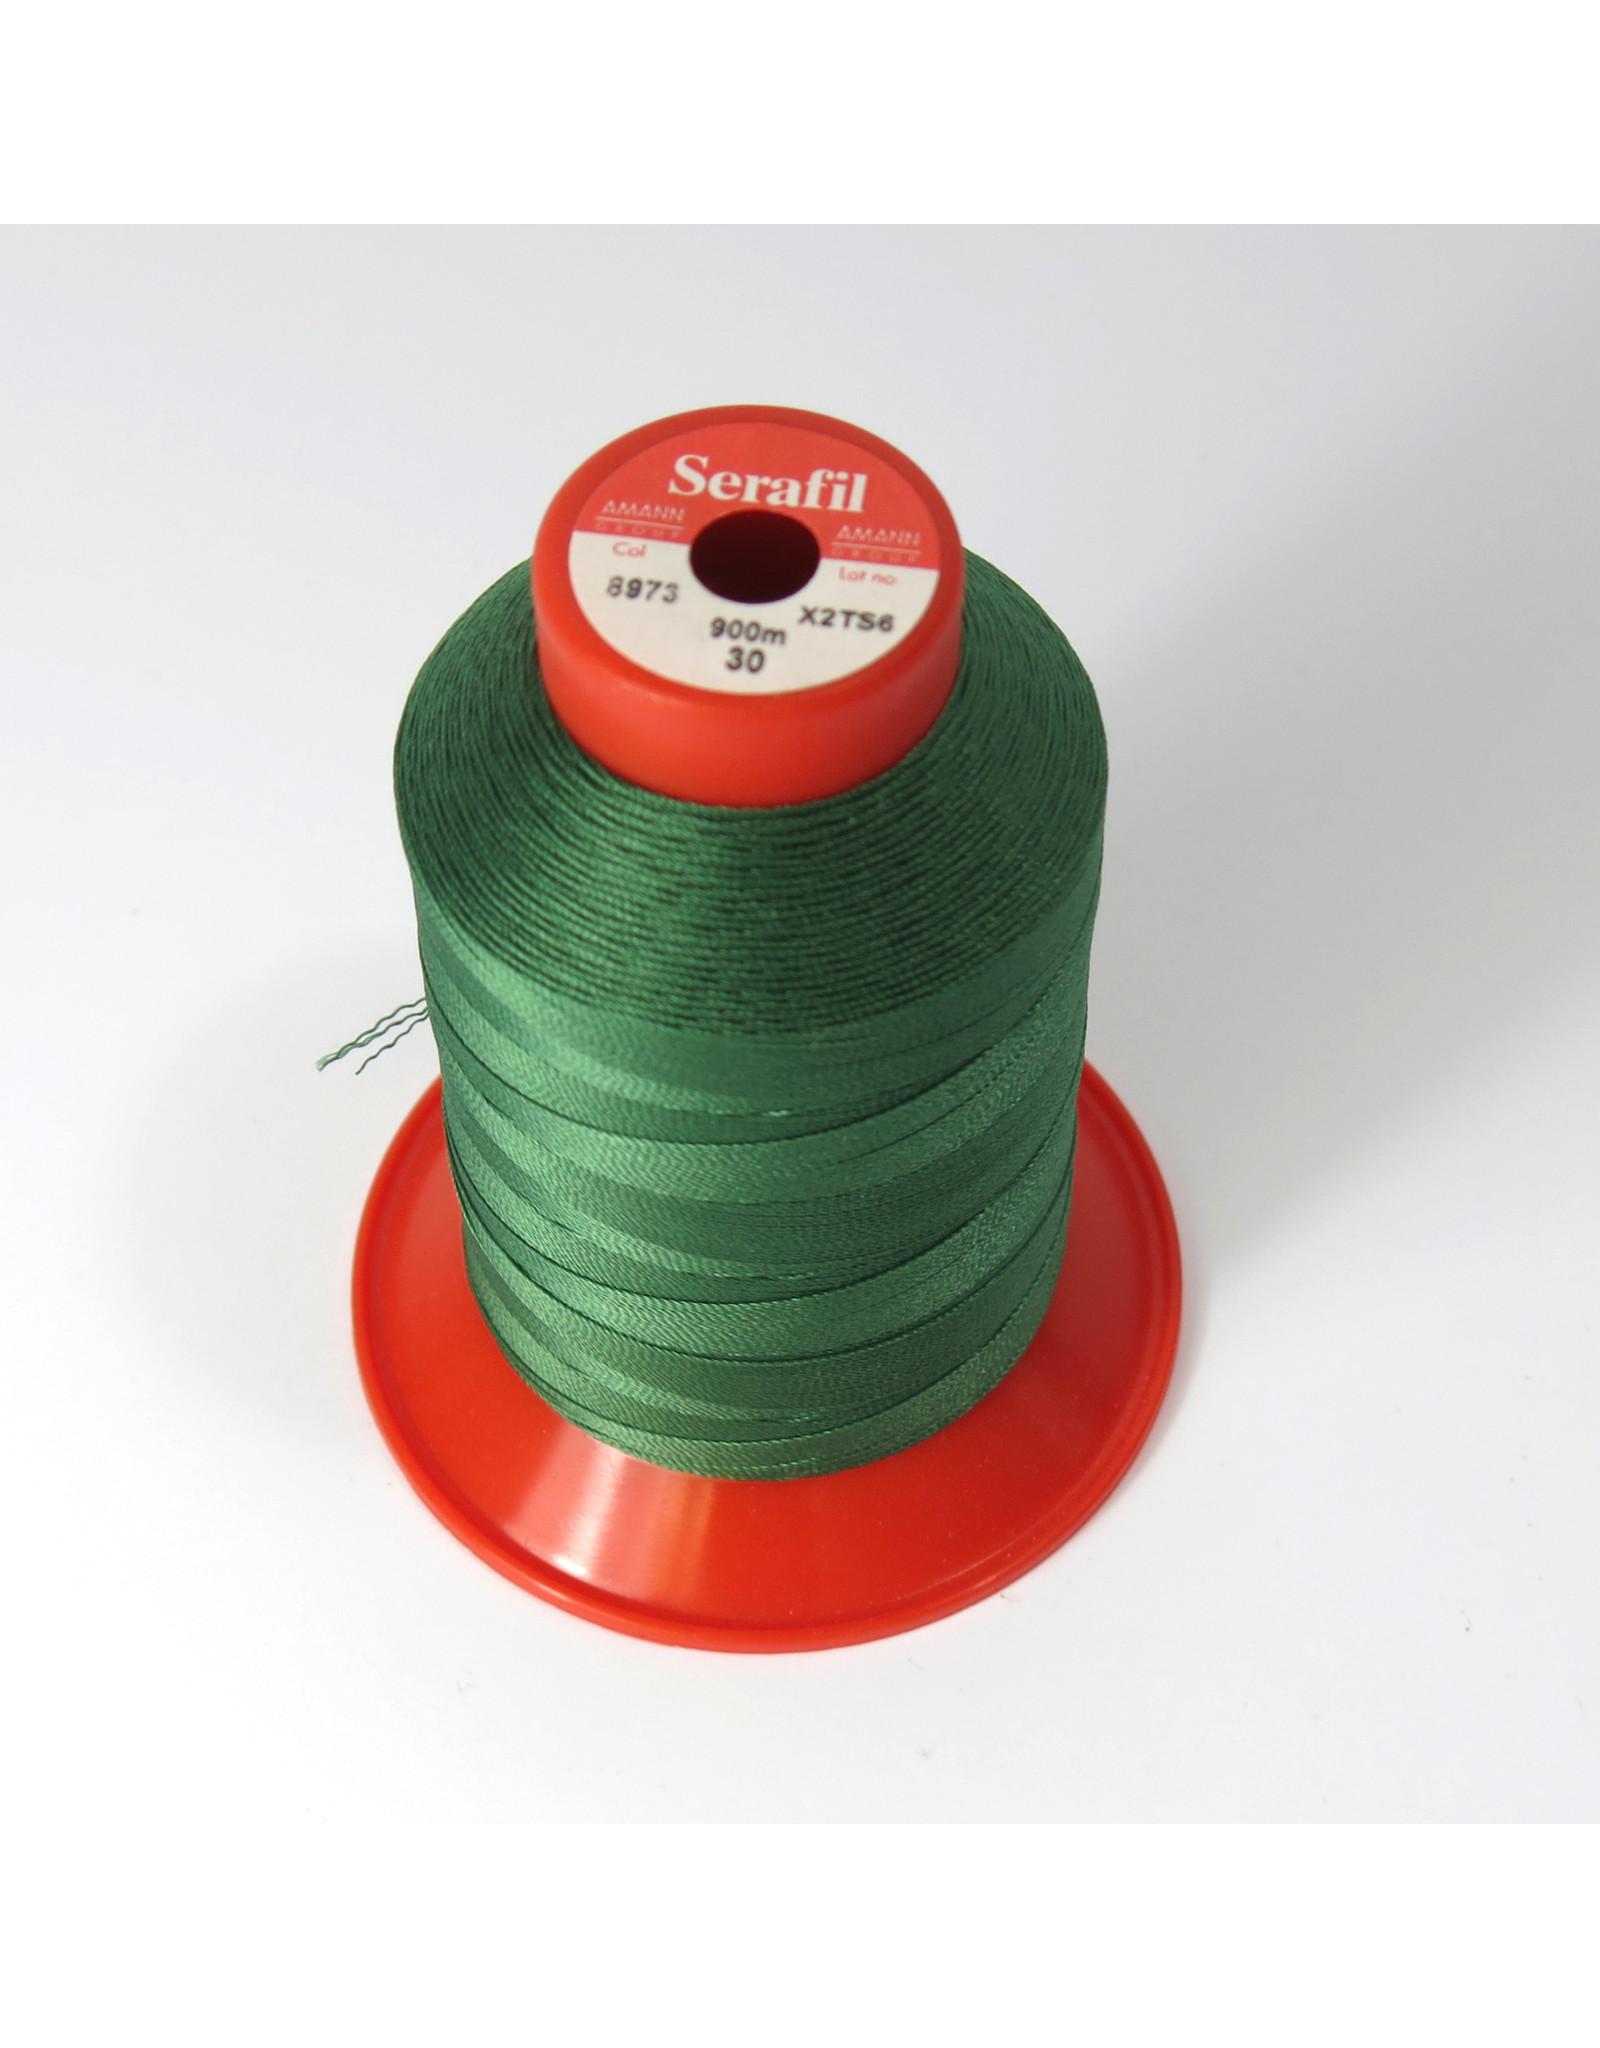 Serafil machine sewing threads 8973